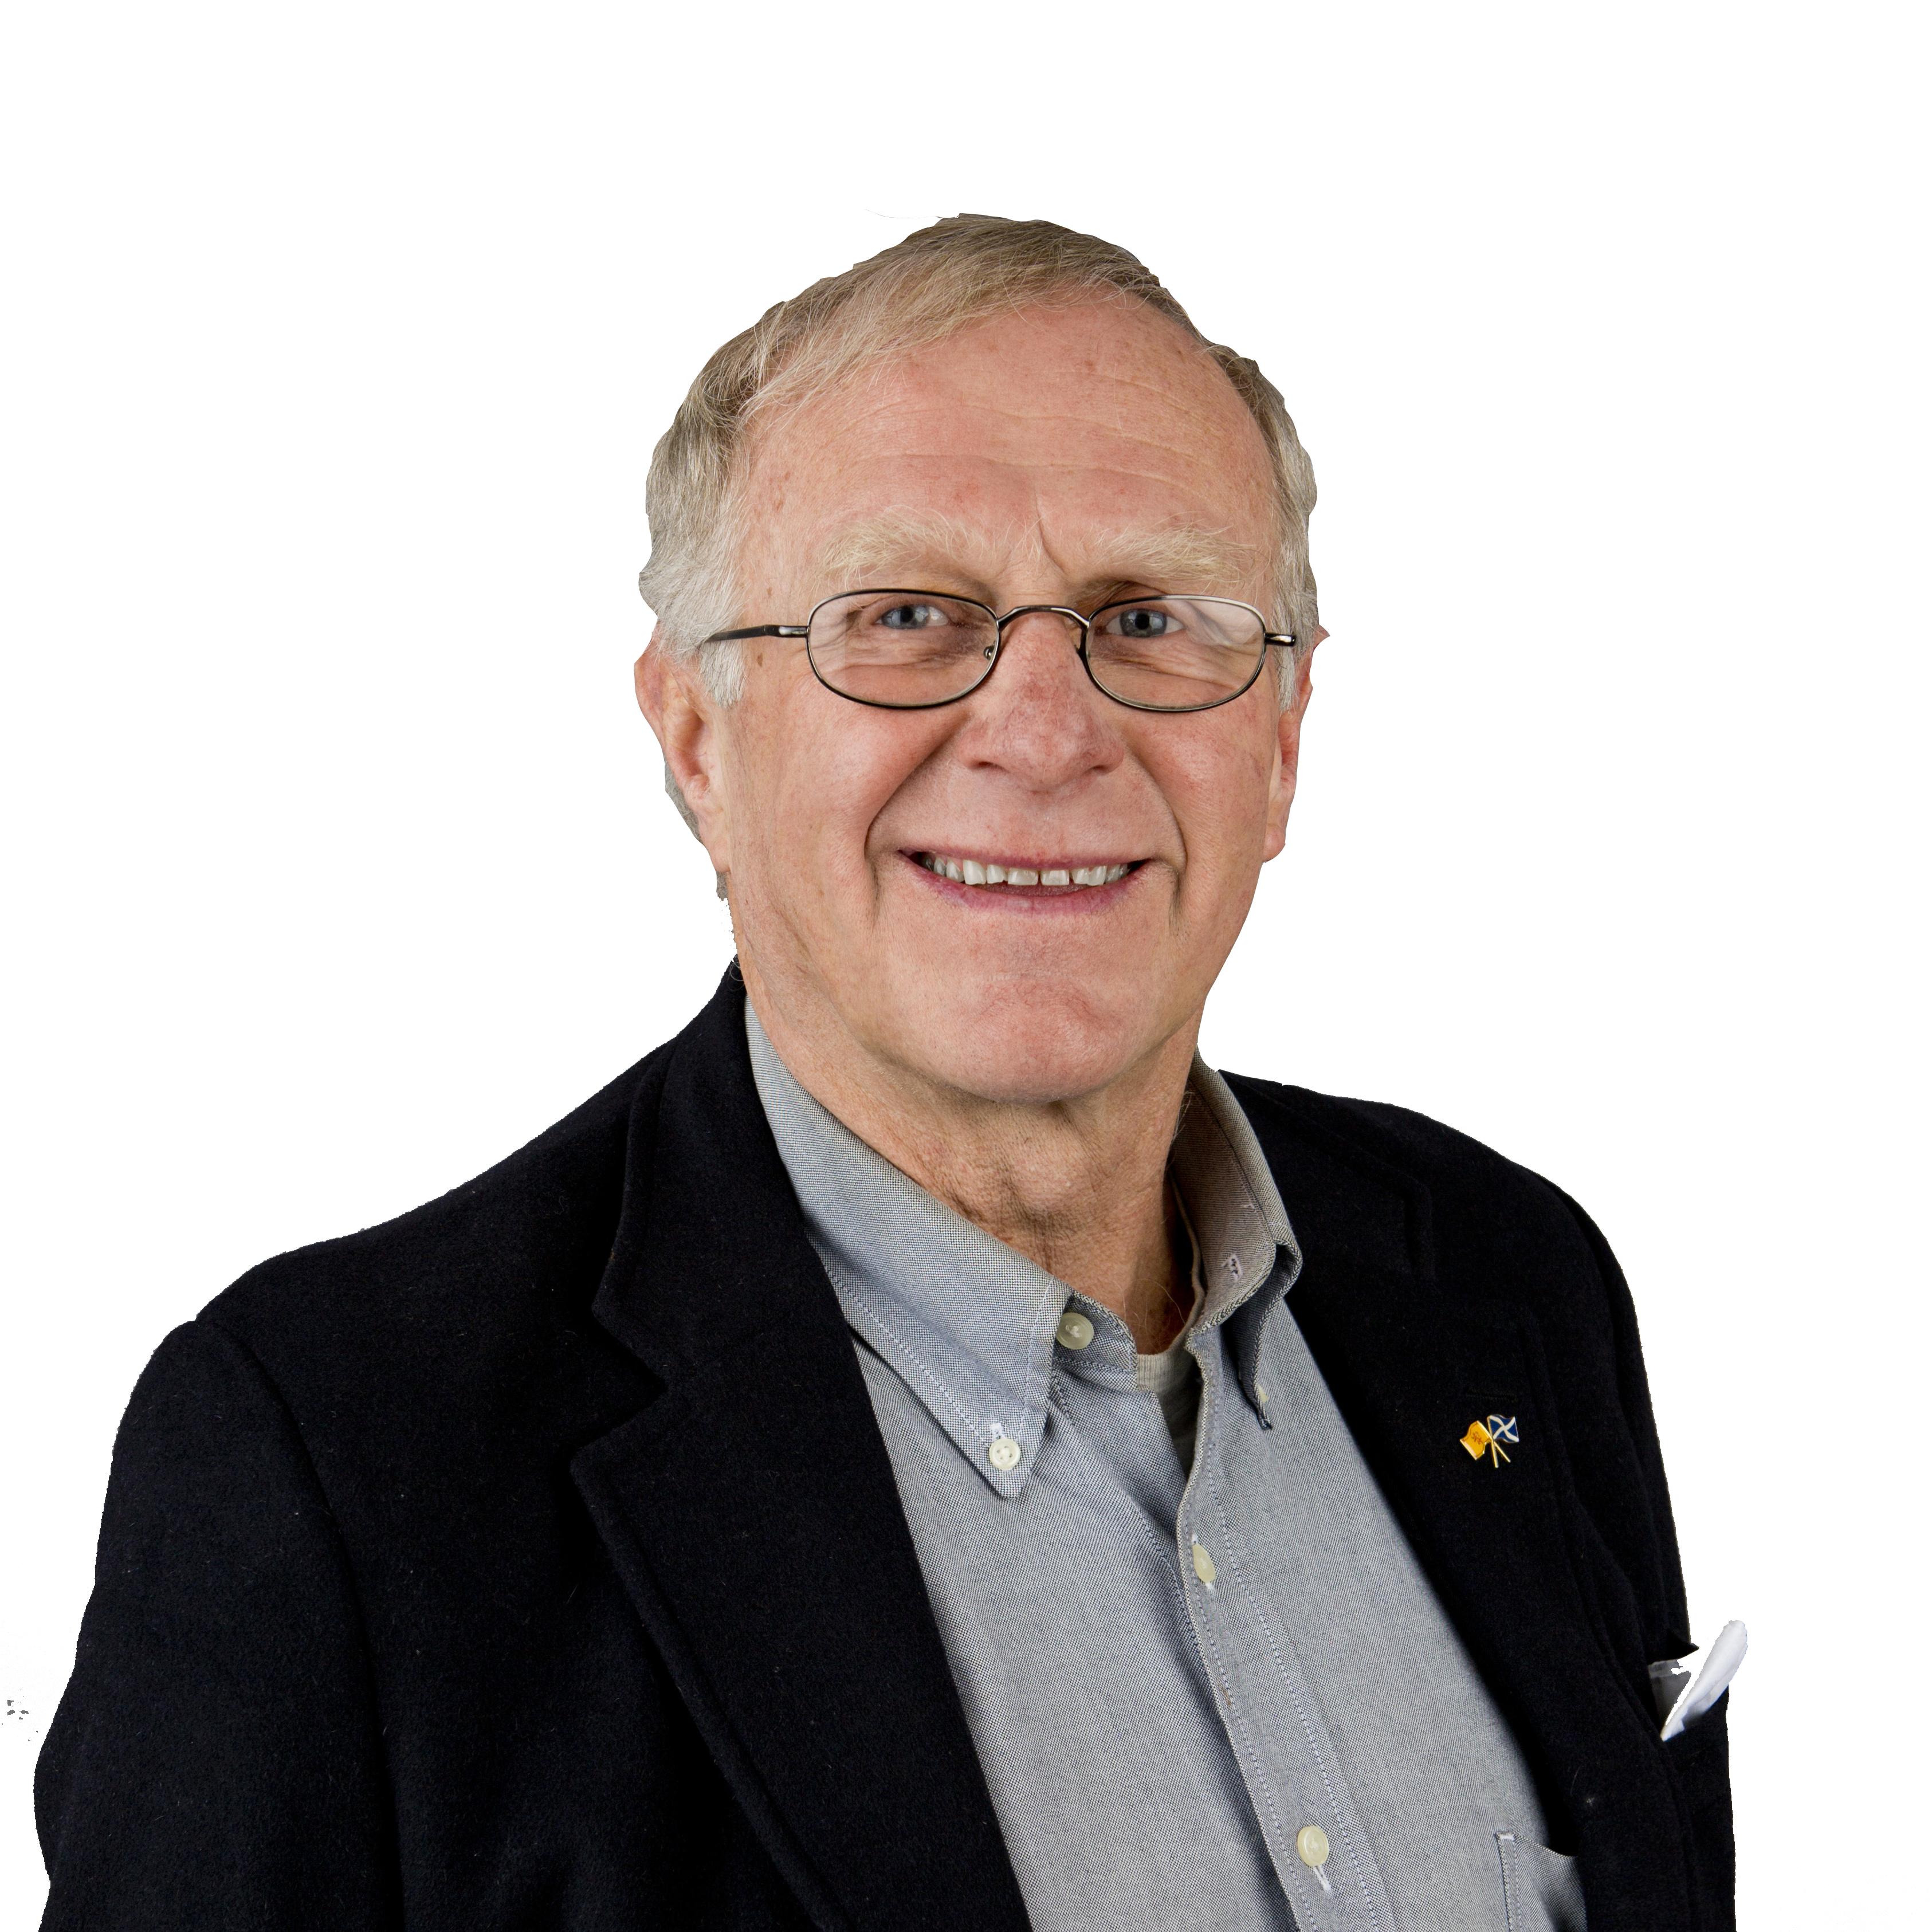 Norm McLean